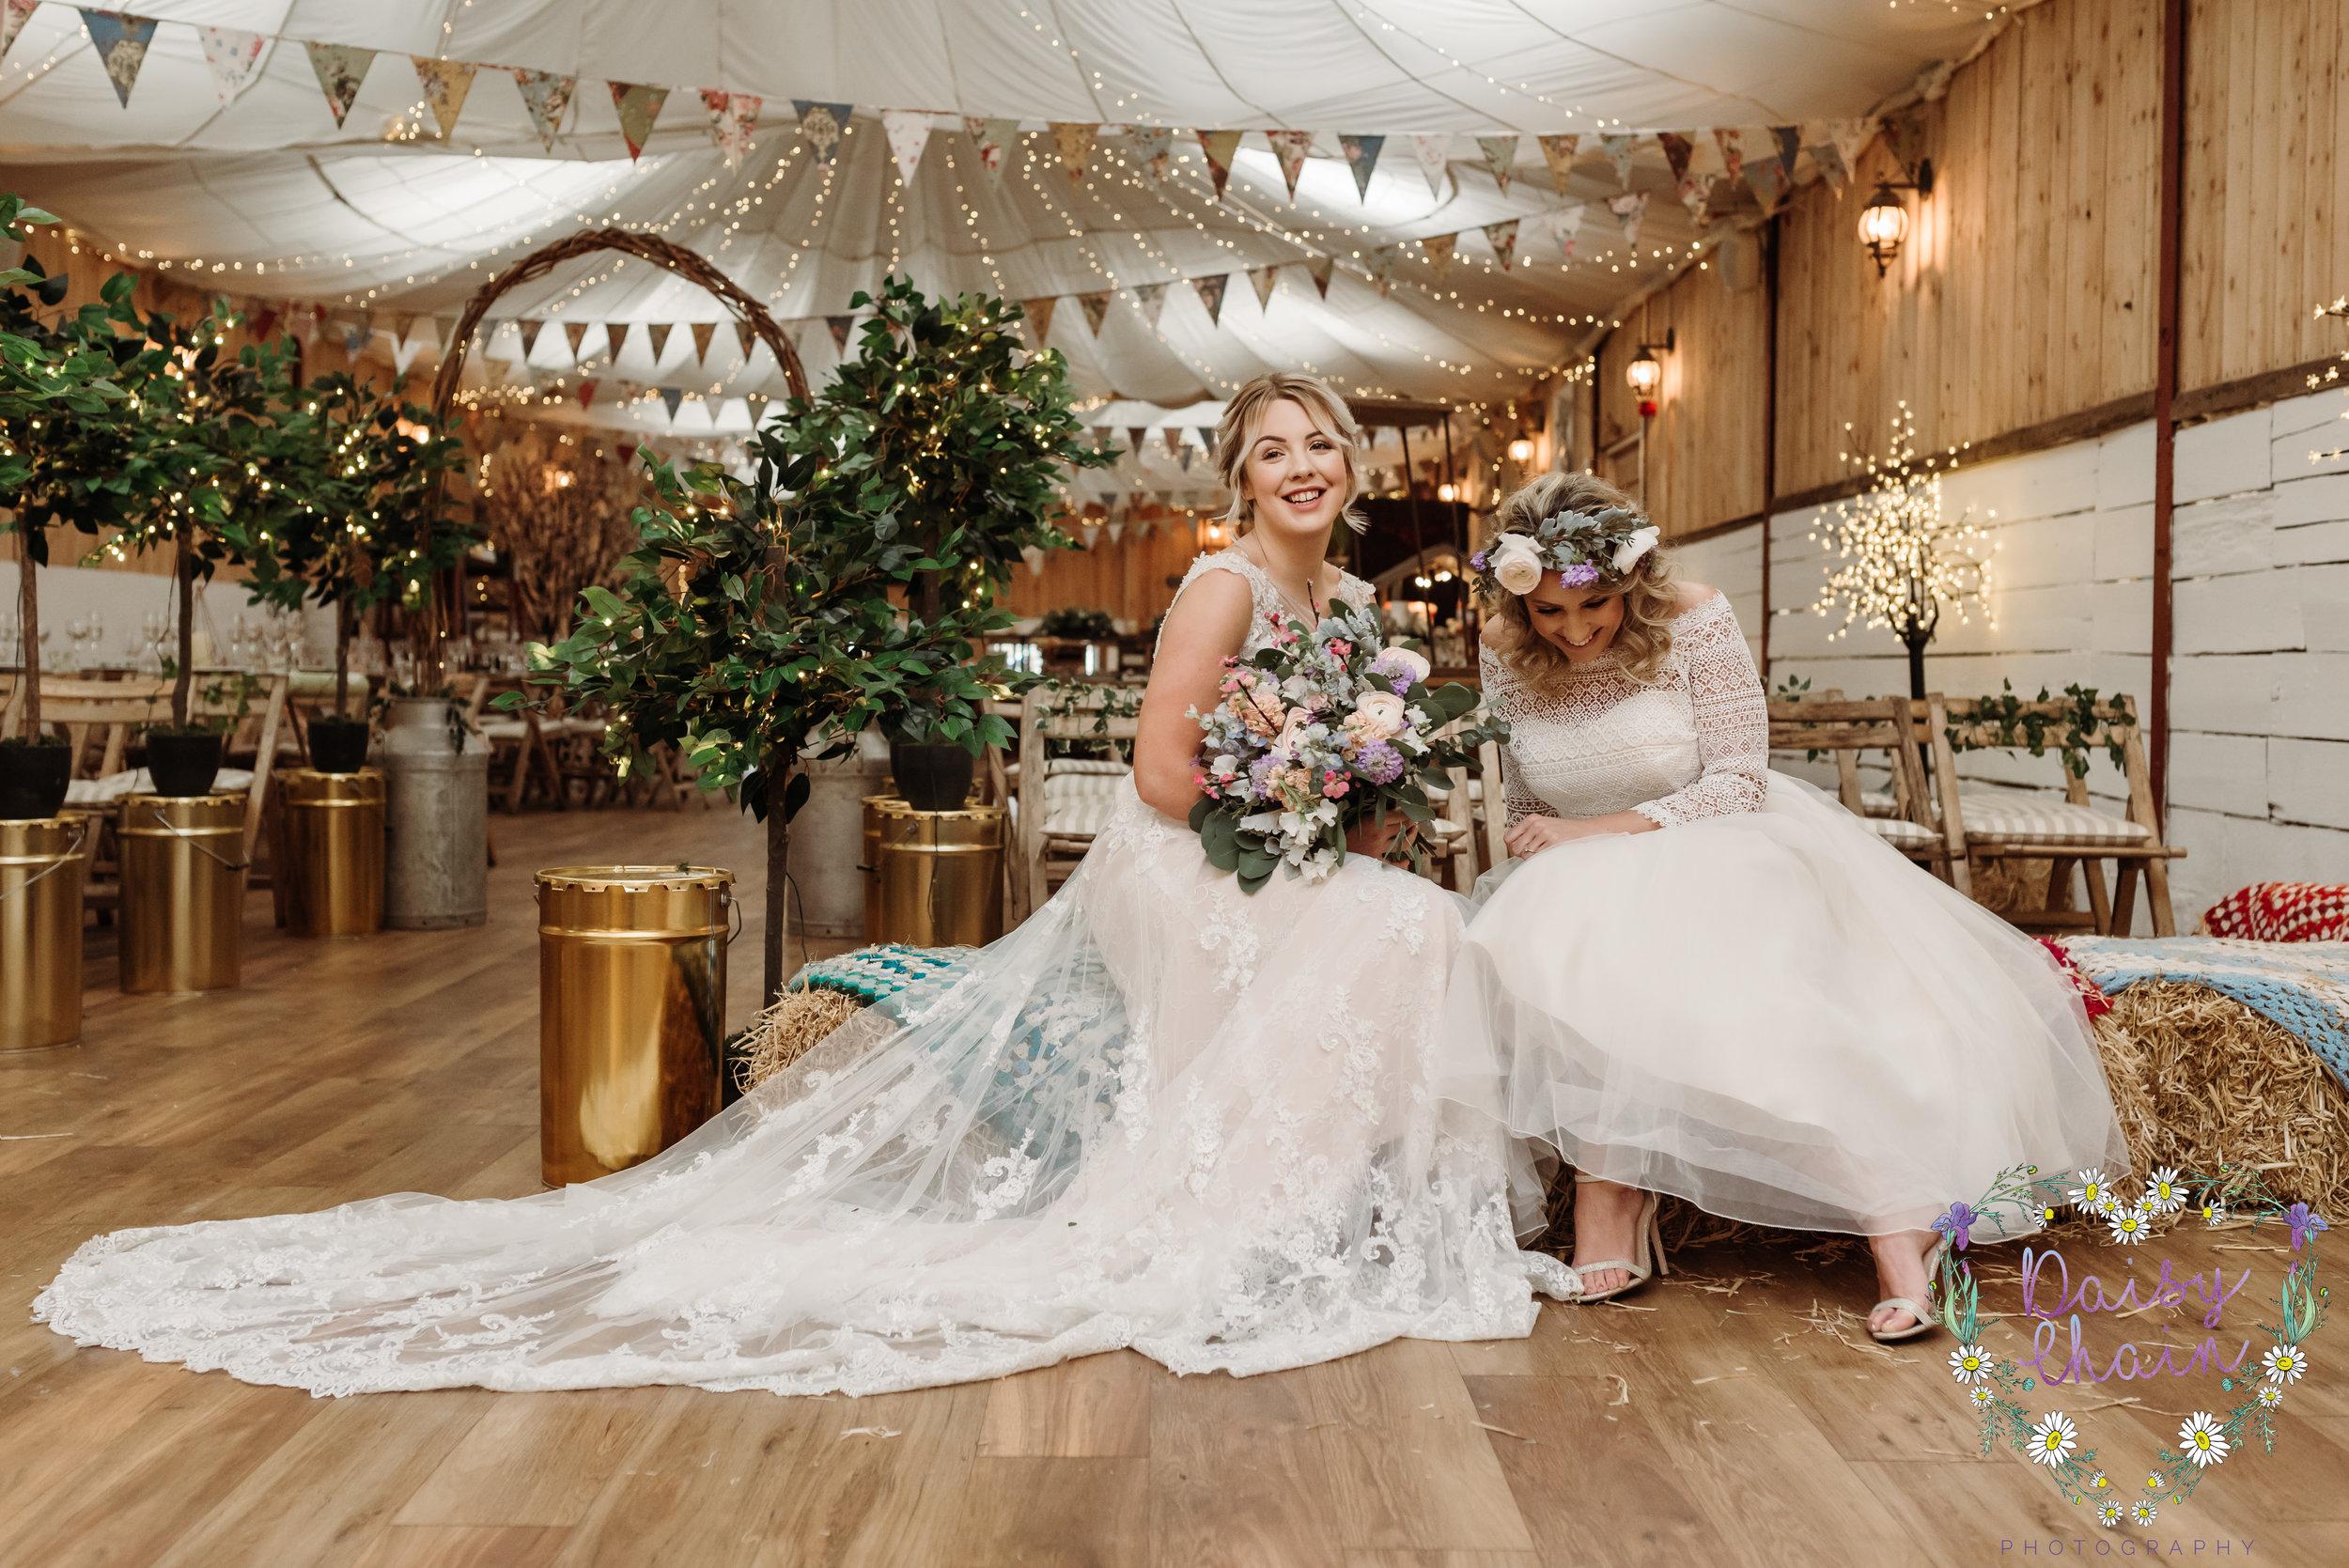 Gorgeous wedding portrait